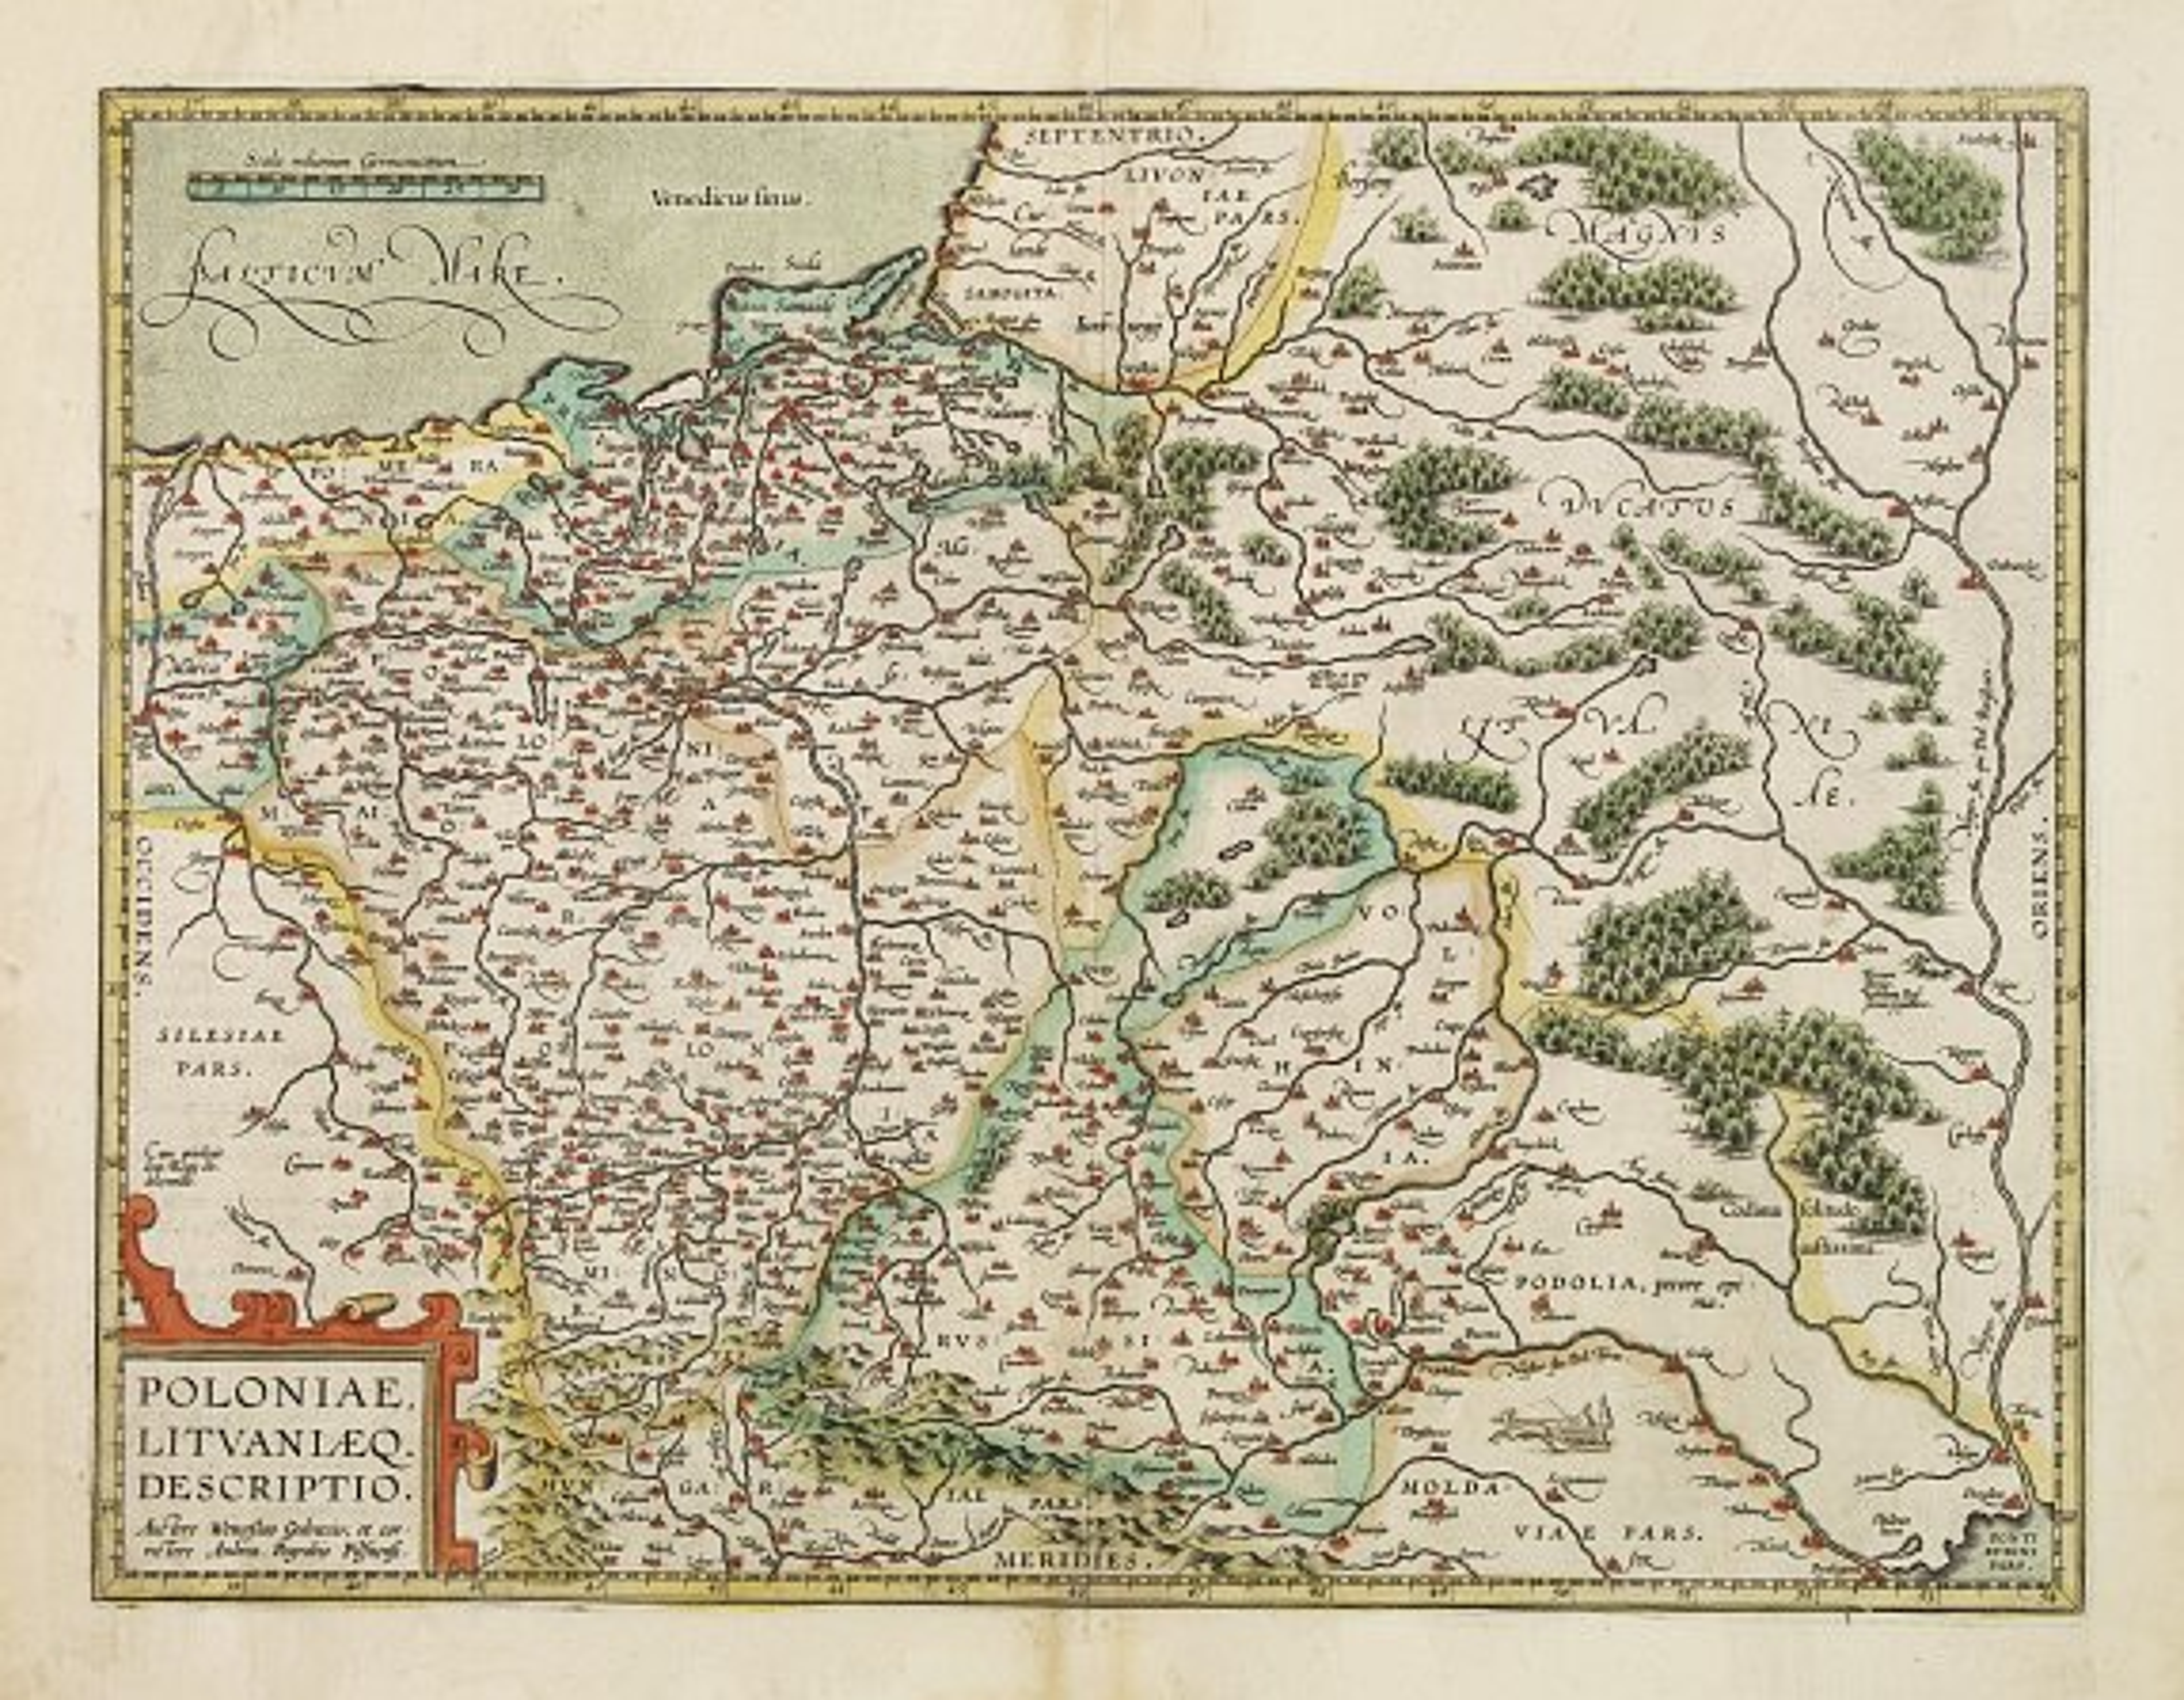 ORTELIUS, A. -  Poloniae, Lituaniaeq descriptio.